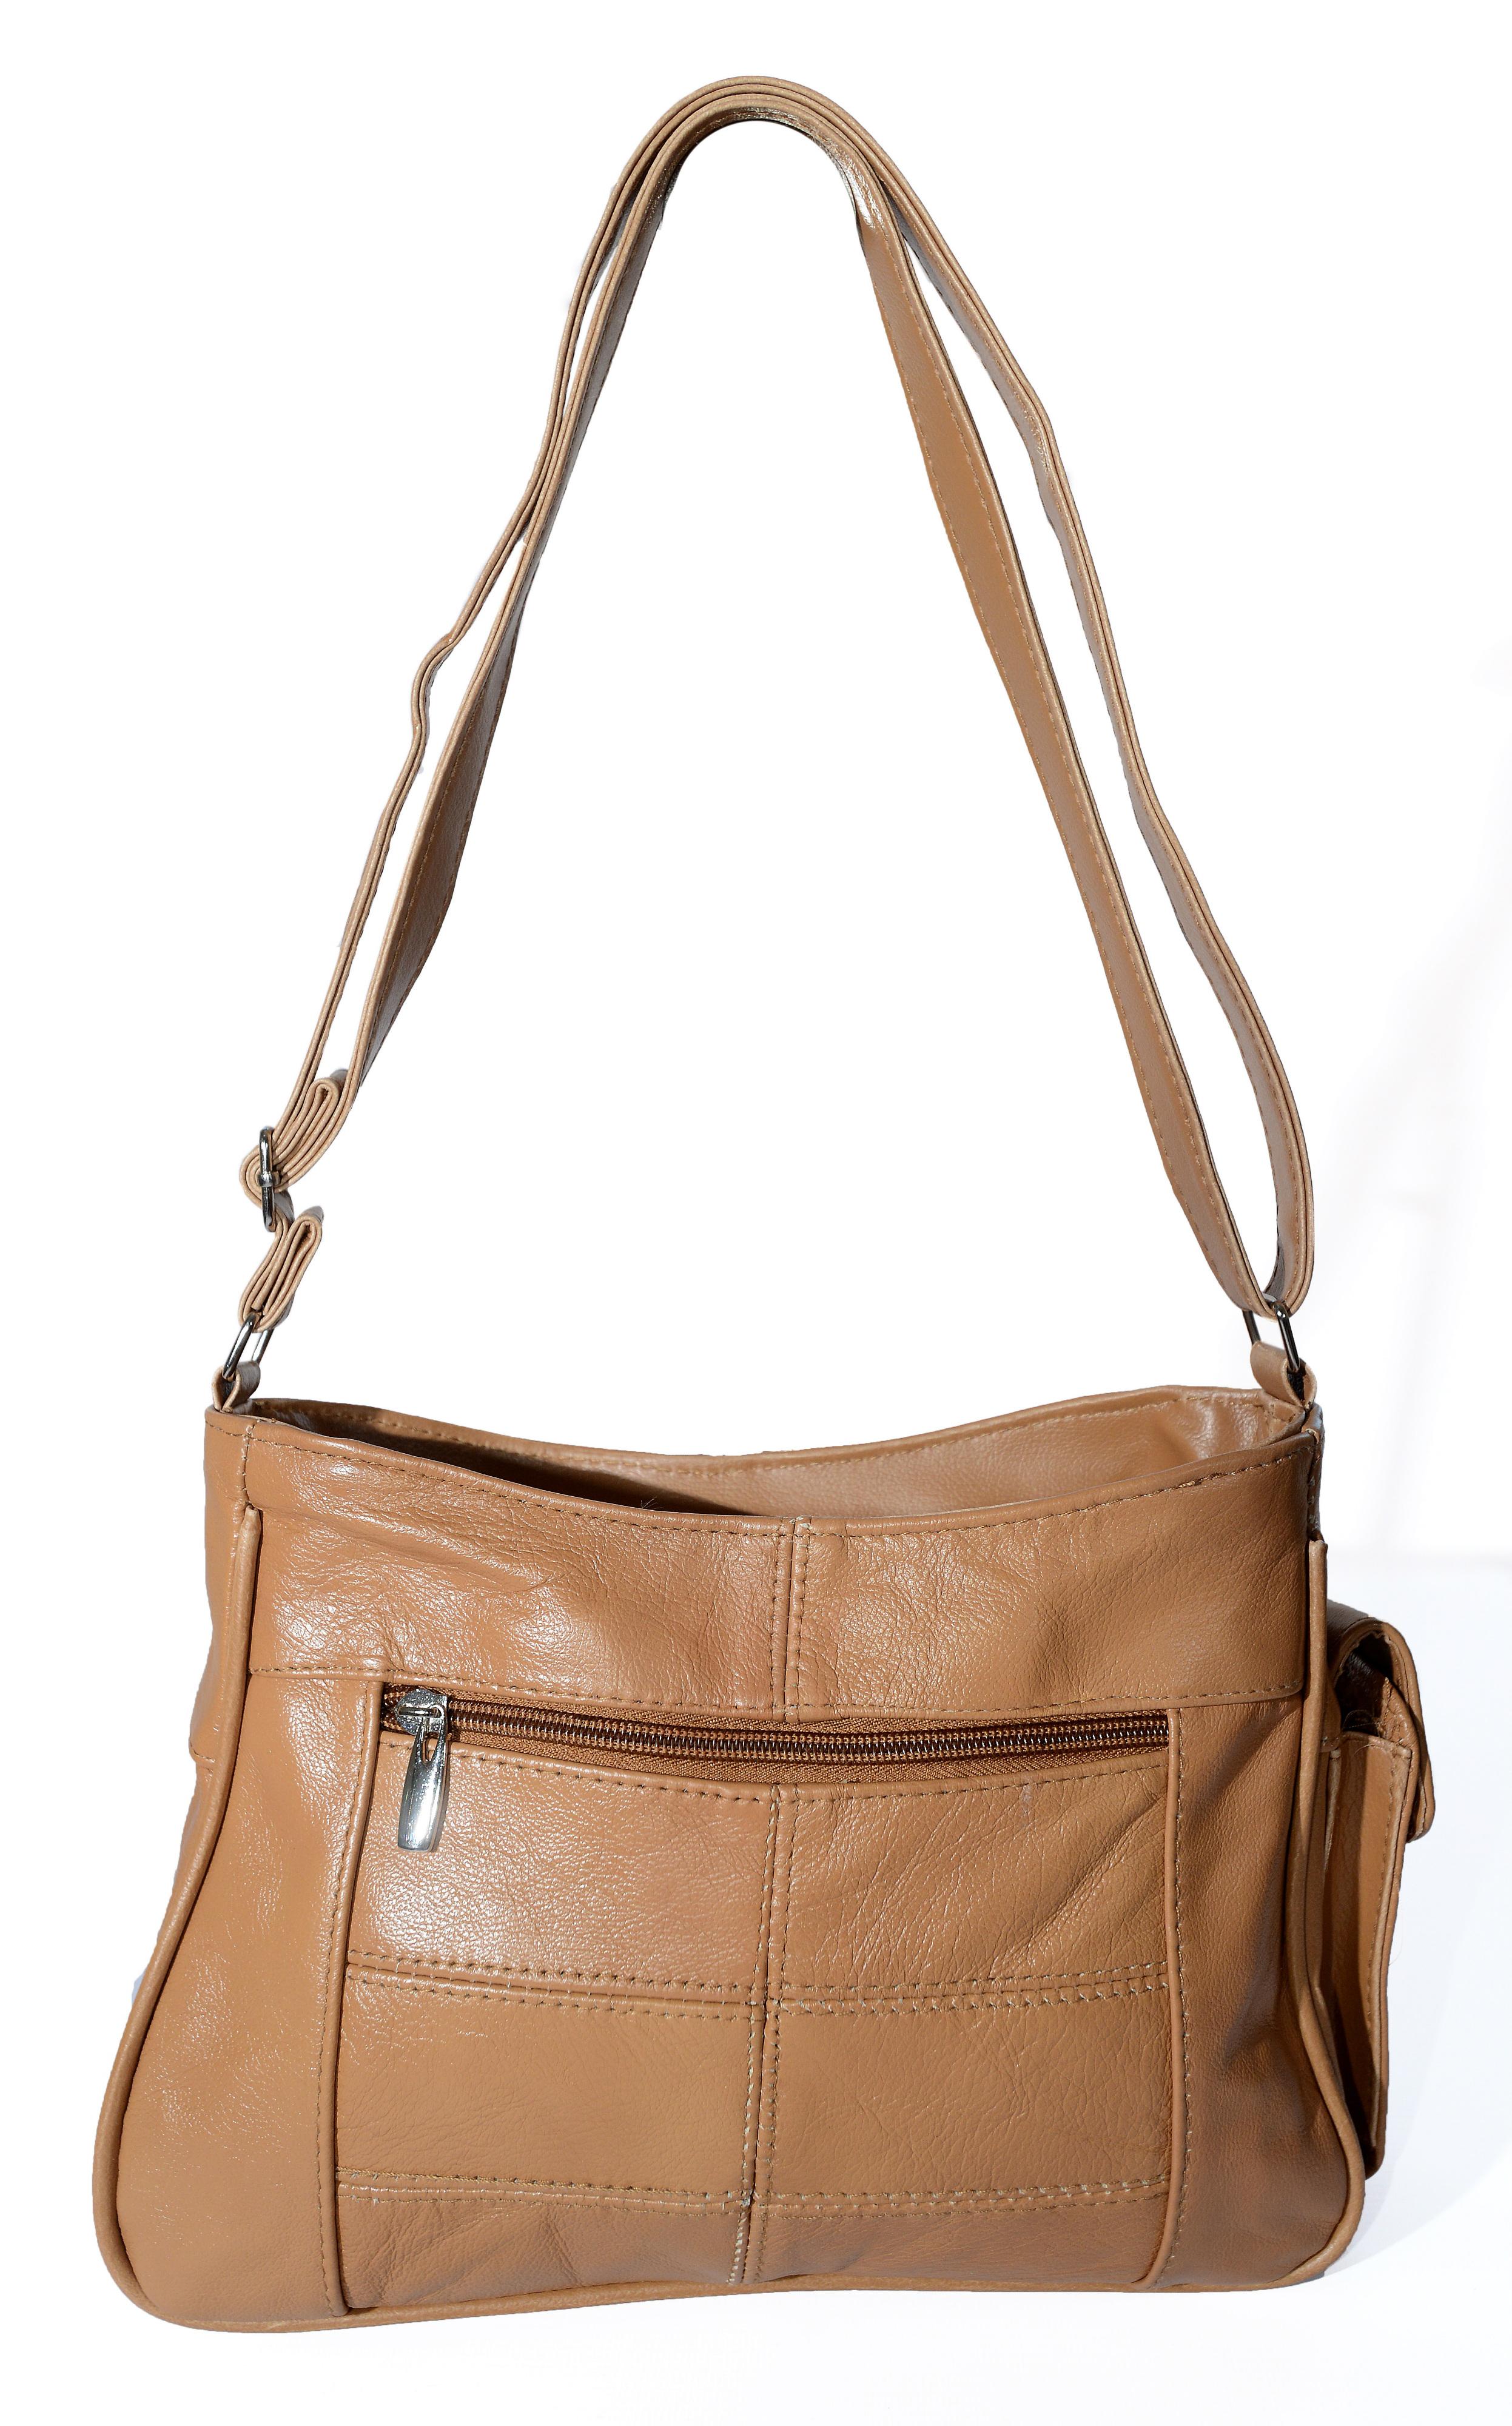 Lorenz Womens Dark Tan Brown Pleated Real Leather Shoulder Bag Handbag